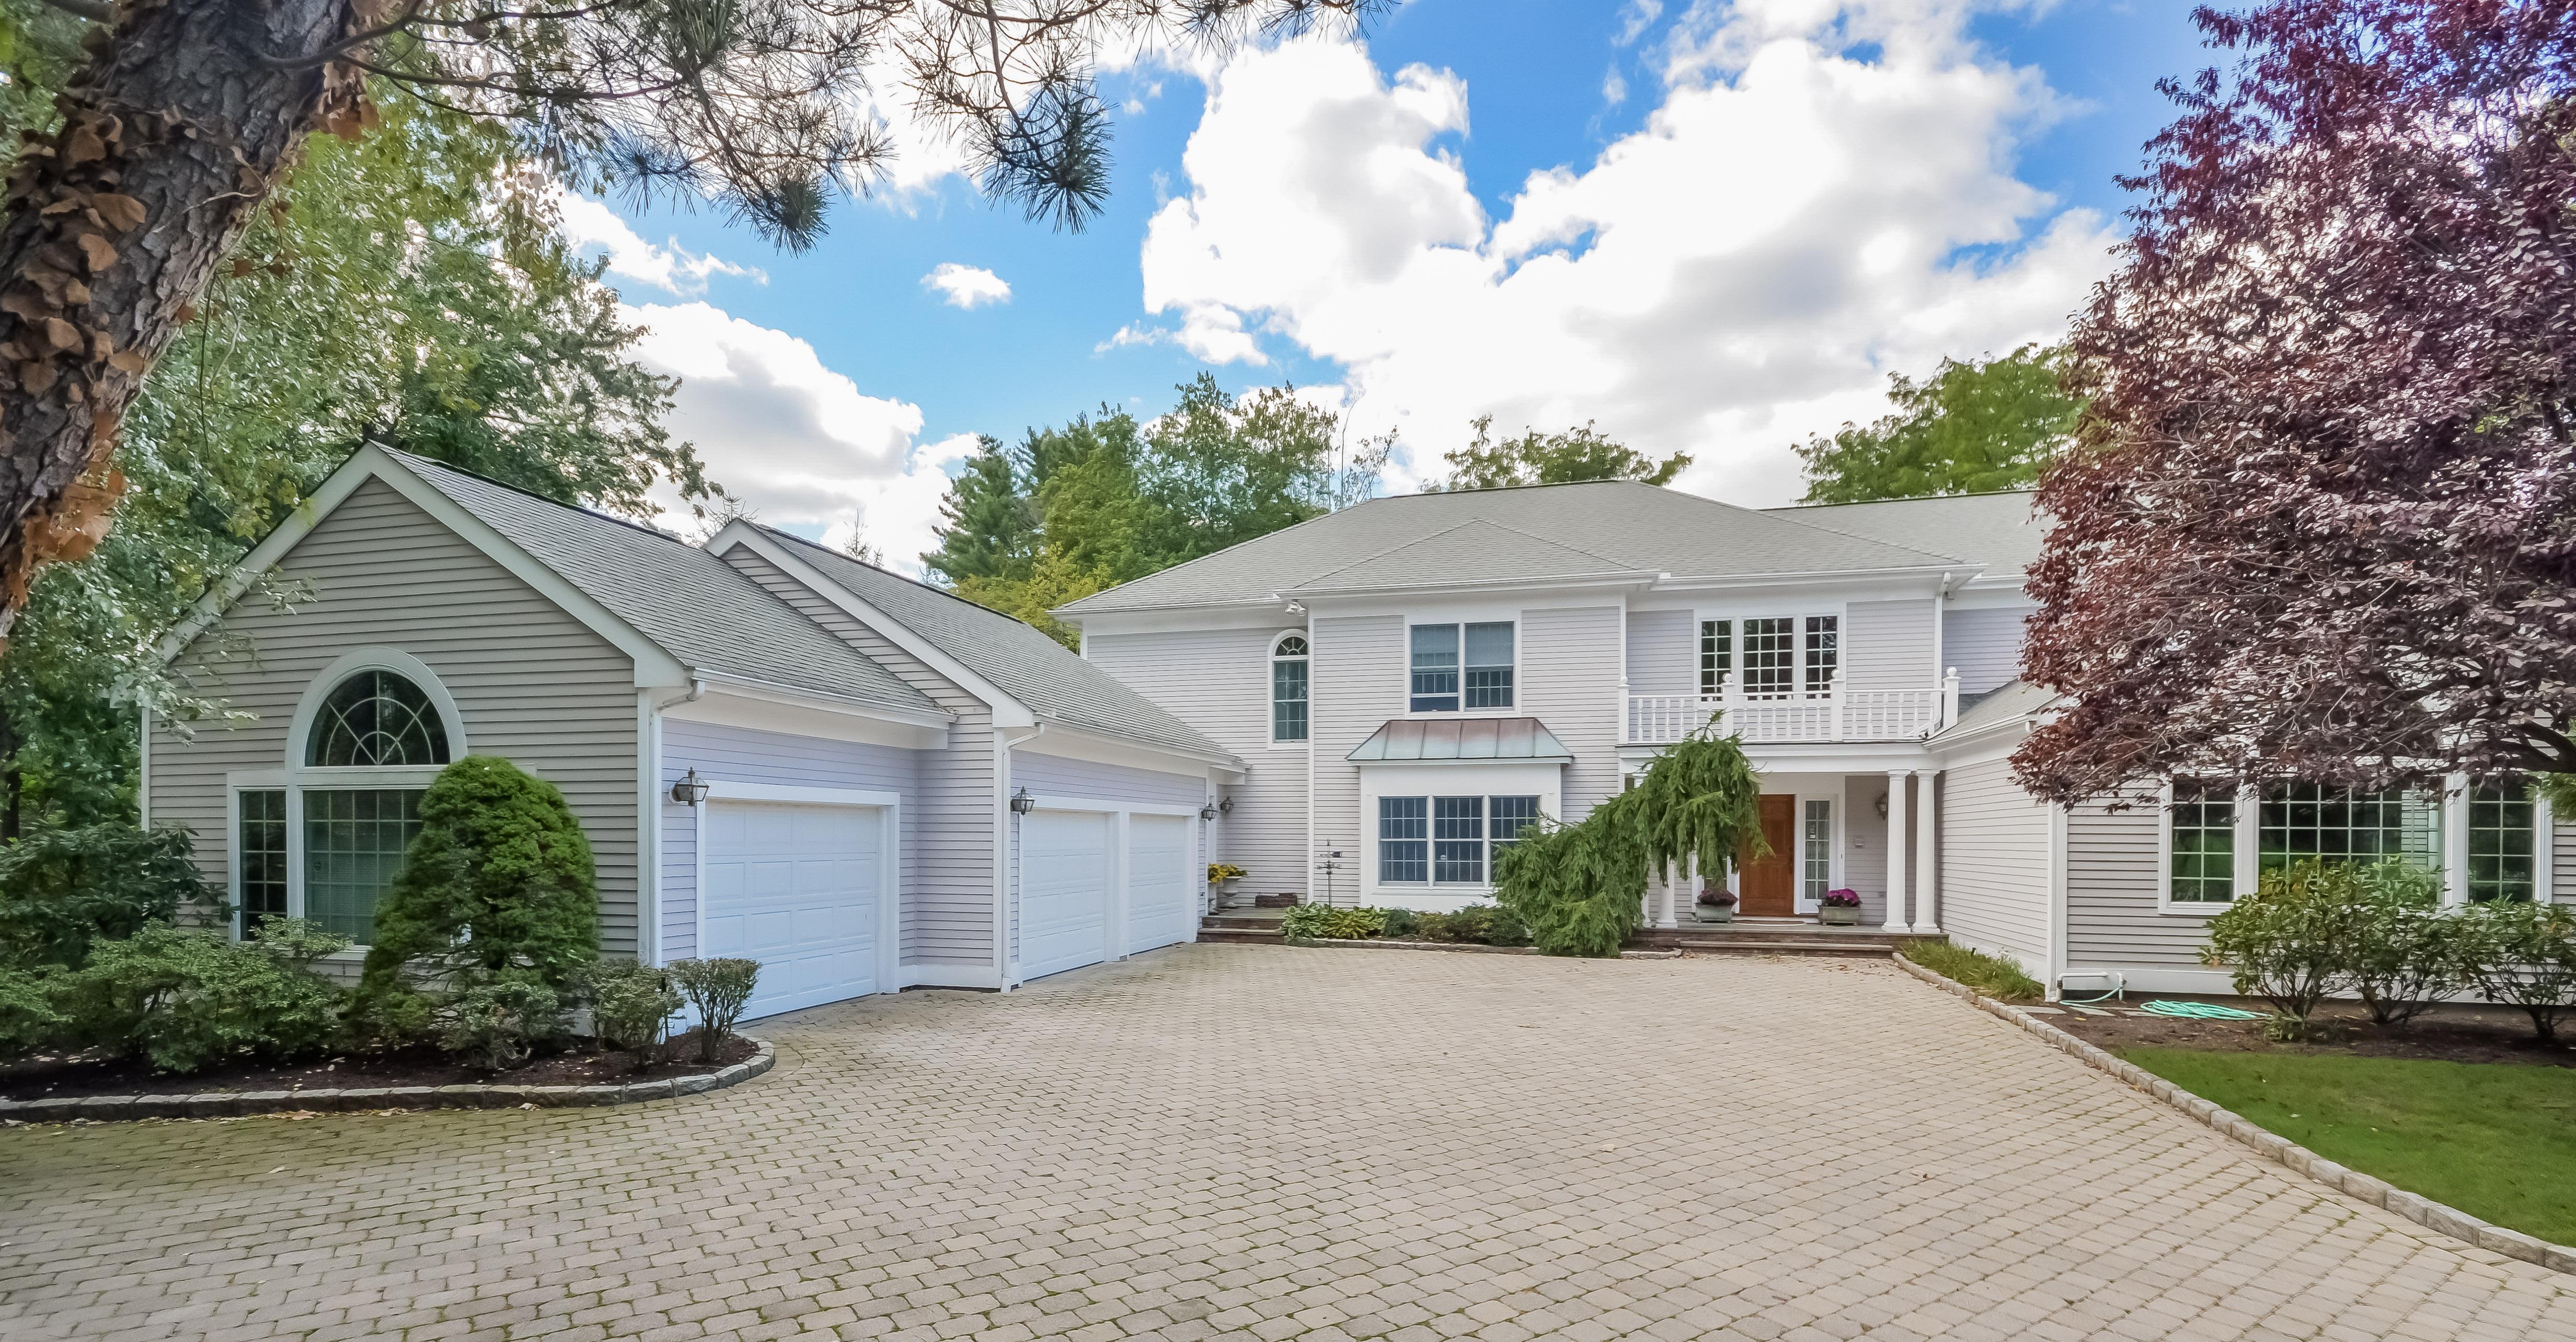 Moradia para Venda às Spectacular Sun Drenched Colonial 8 Sundale Place Scarsdale, Nova York 10583 Estados Unidos